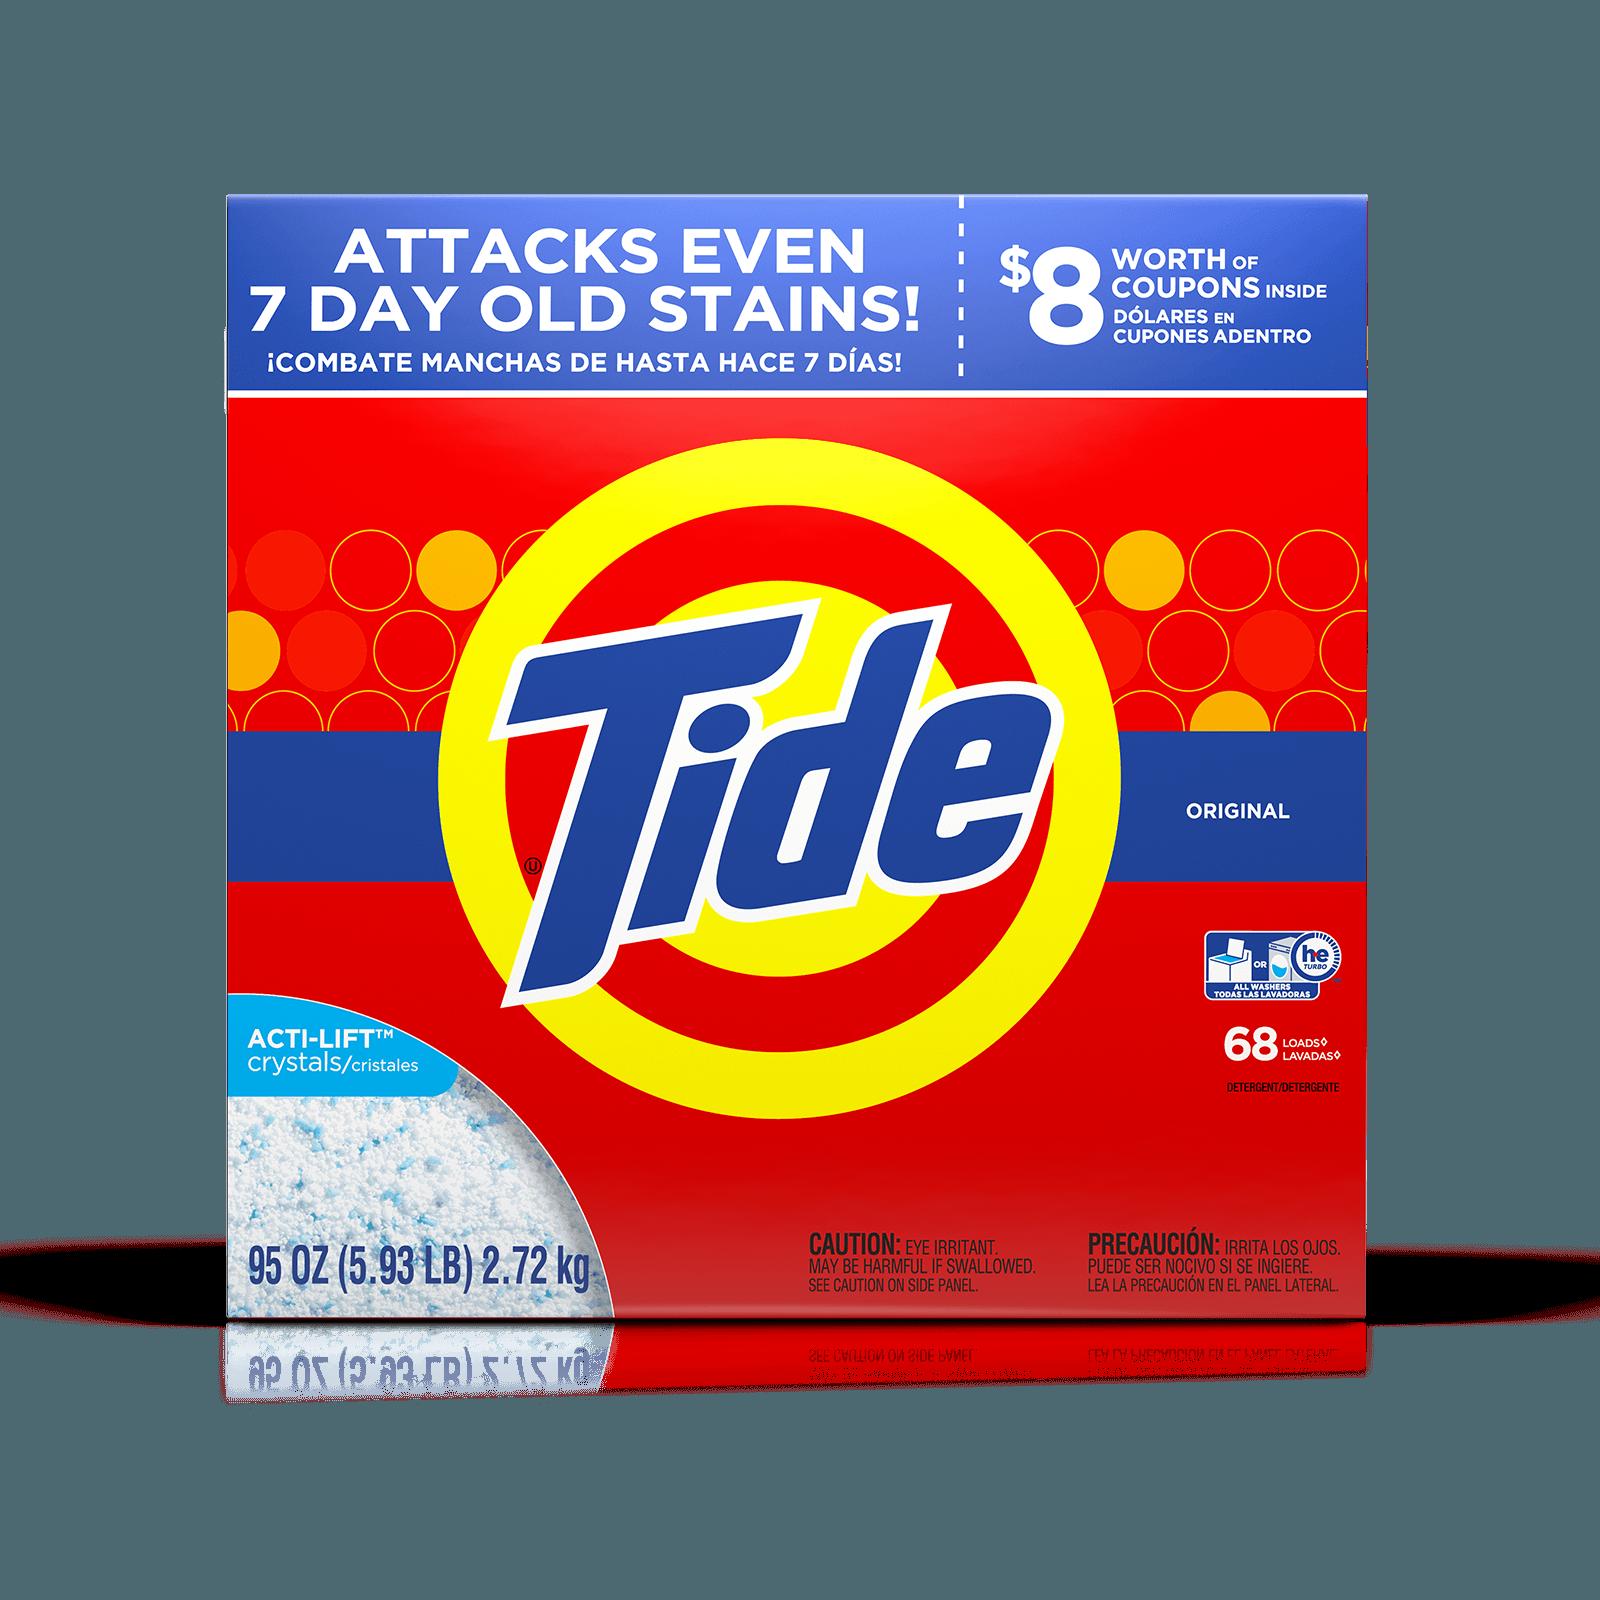 Laundry tide detergent